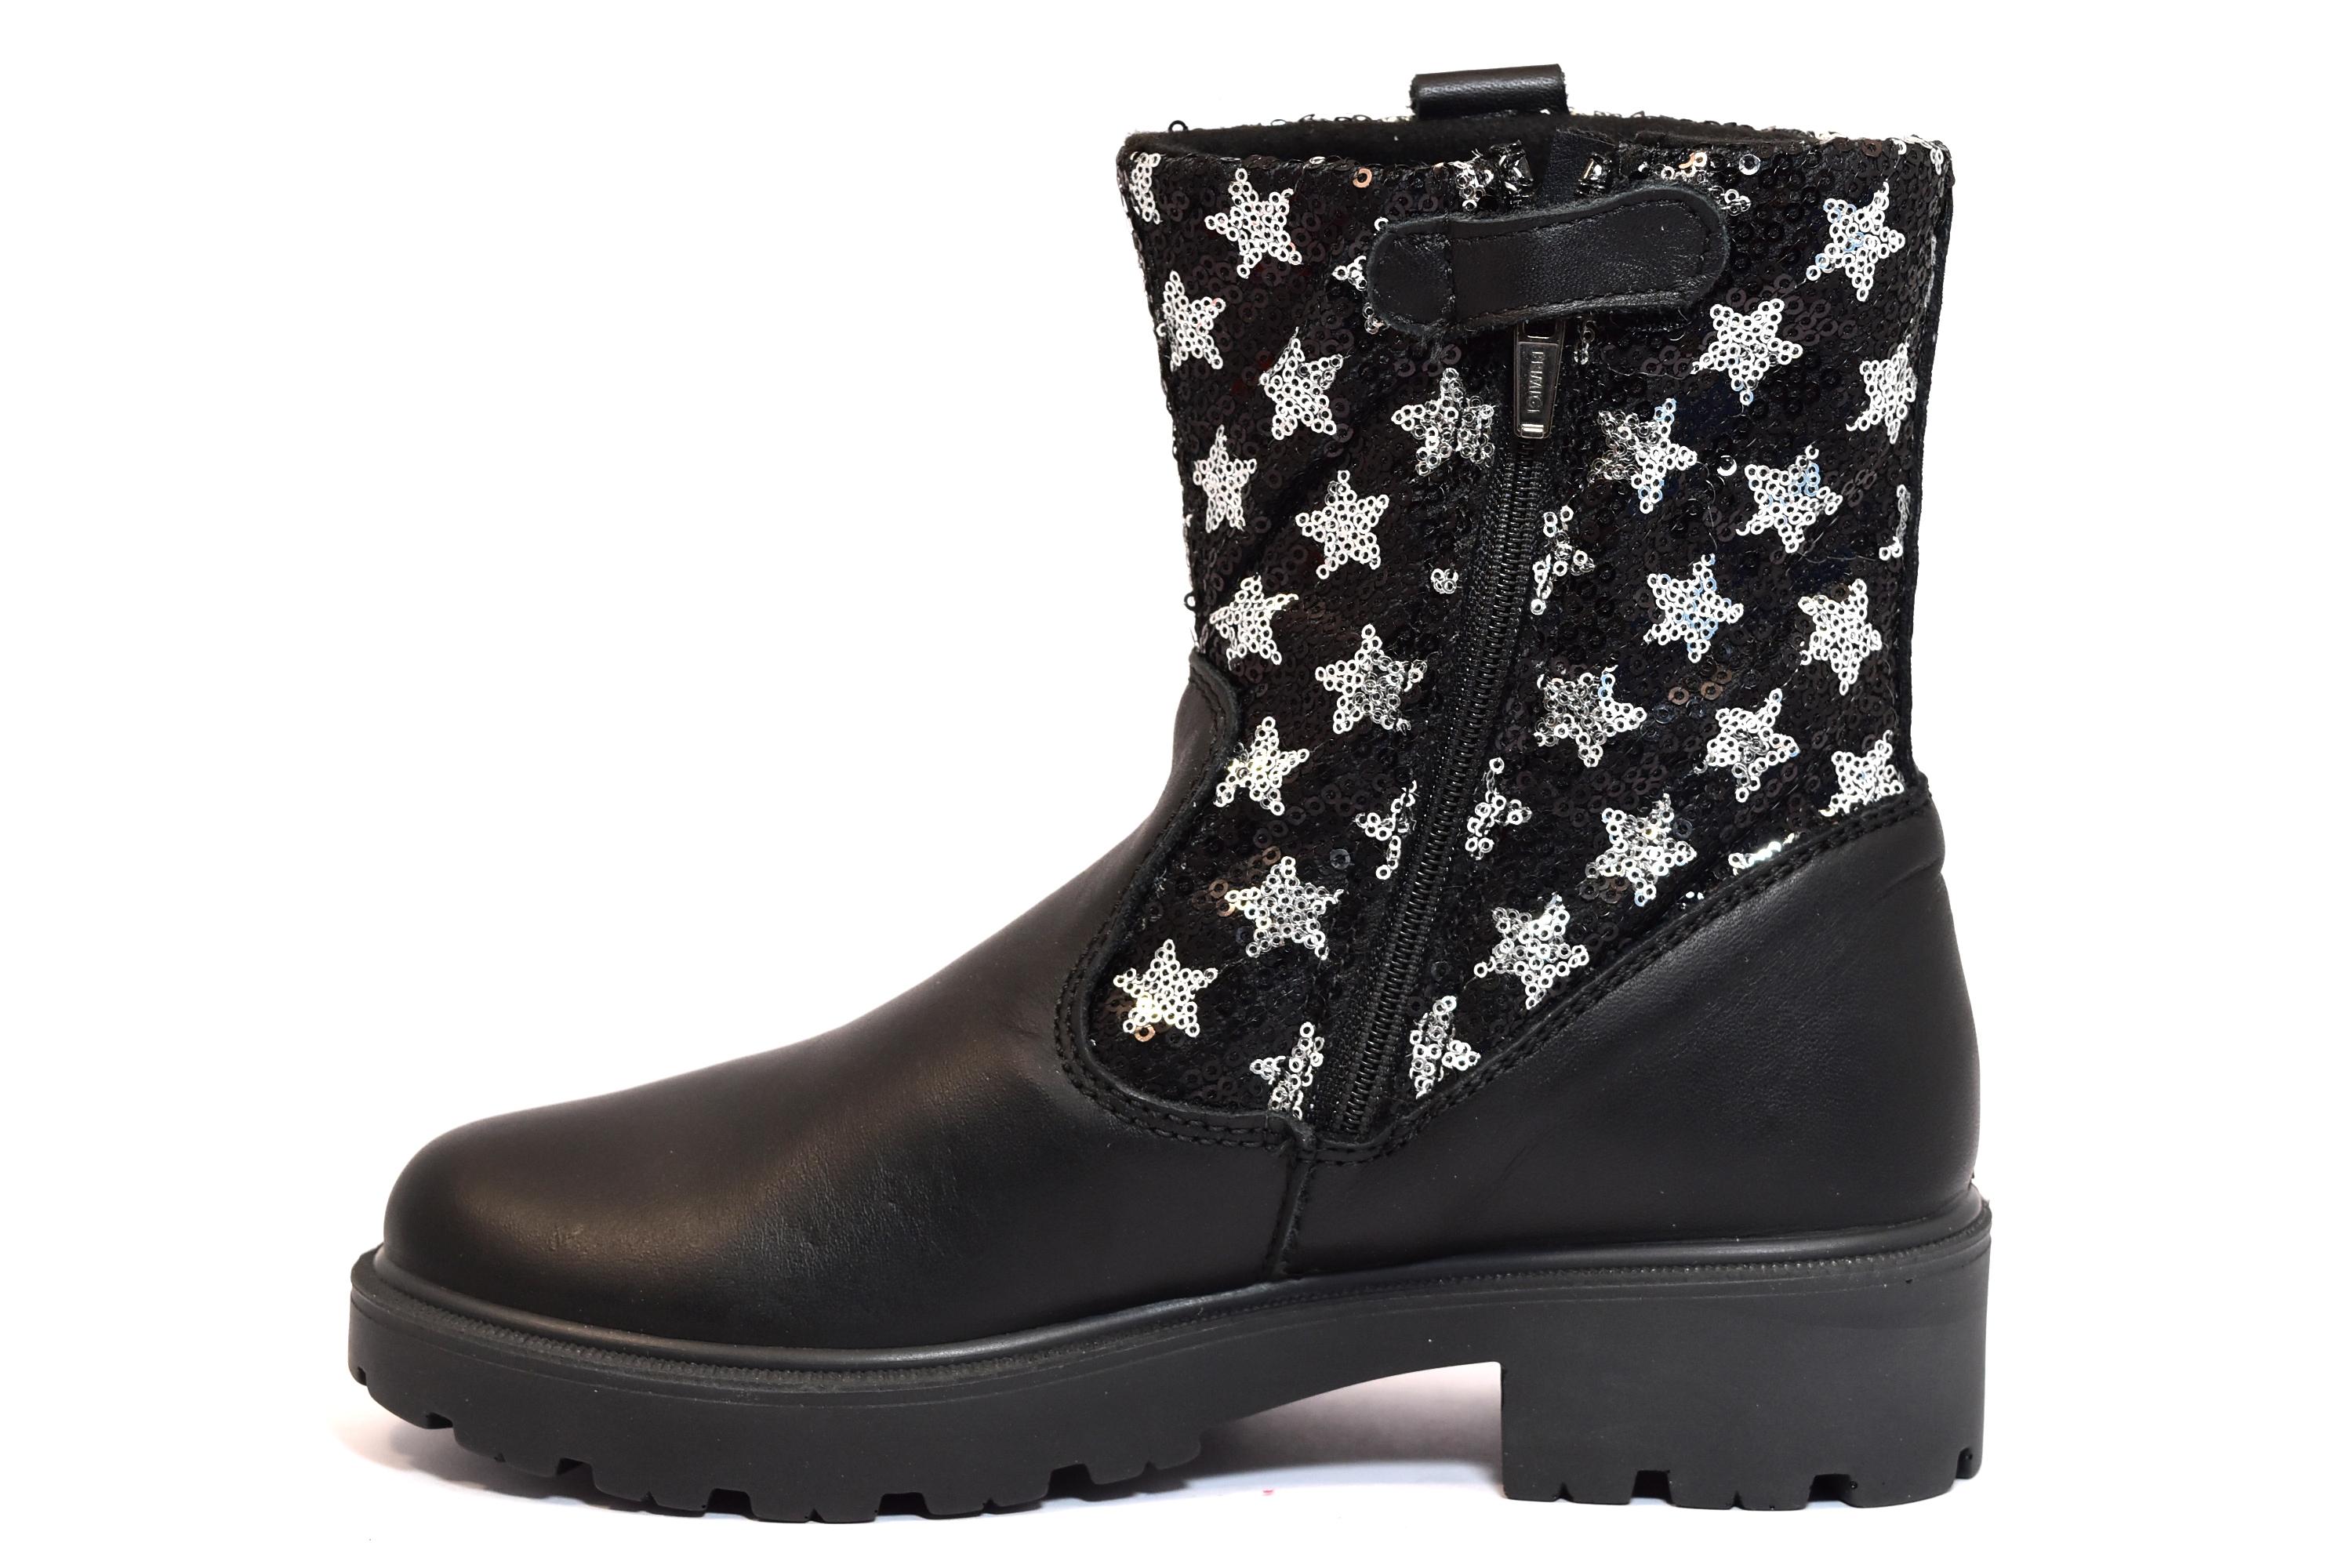 Sneakers 2018 saldi qualità autentica PRIMIGI 86065 00 NERO